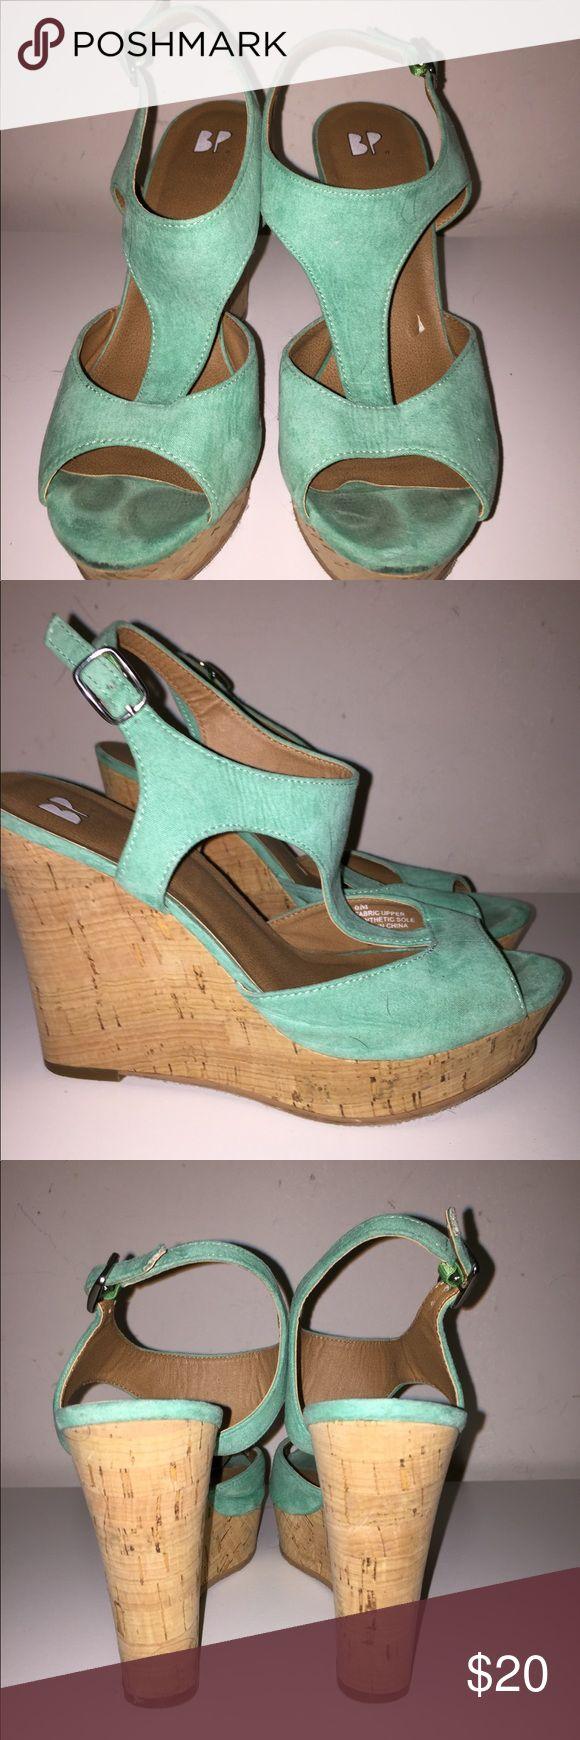 Teal wedges from Nordstrom BP Teal wedge, super cute and trendy! Nordstrom Shoes Heels